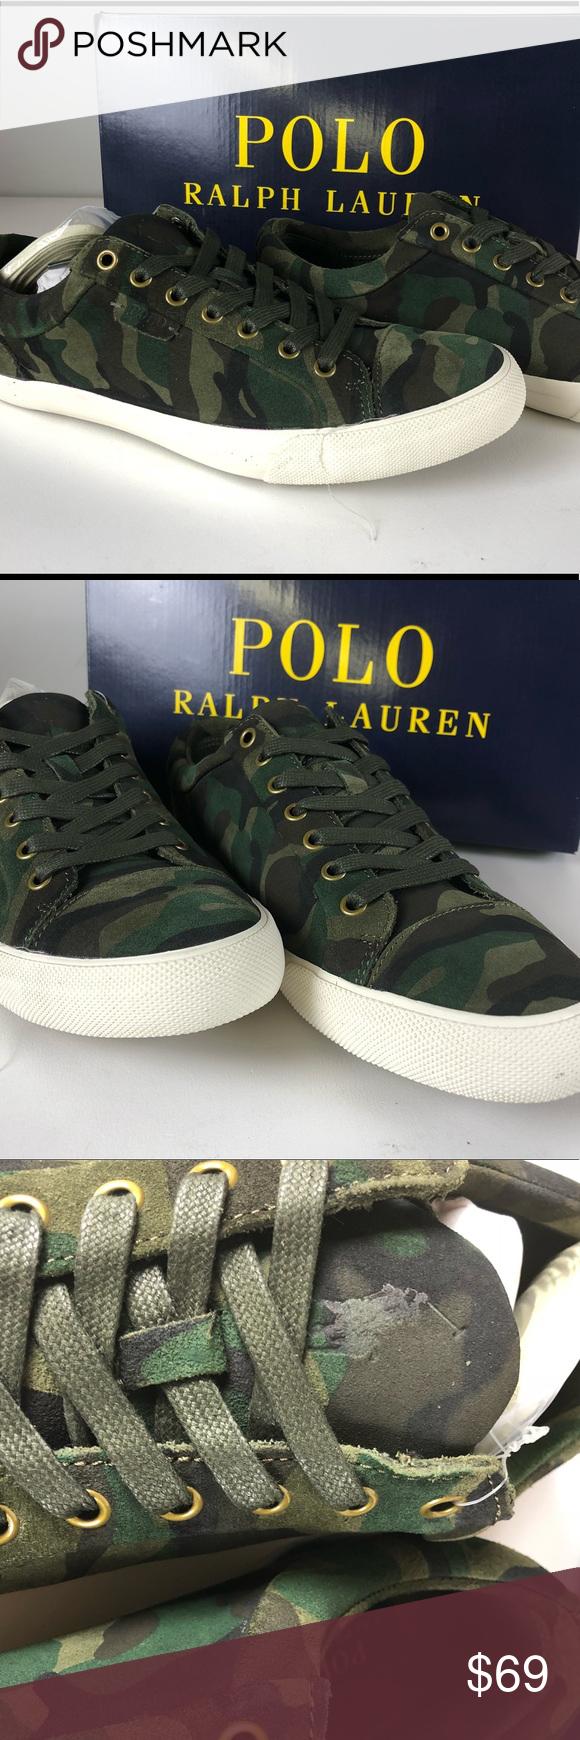 Nib Polo Suede Geffrey Shoes Camo Low Lauren Ralph D2WEIH9Y